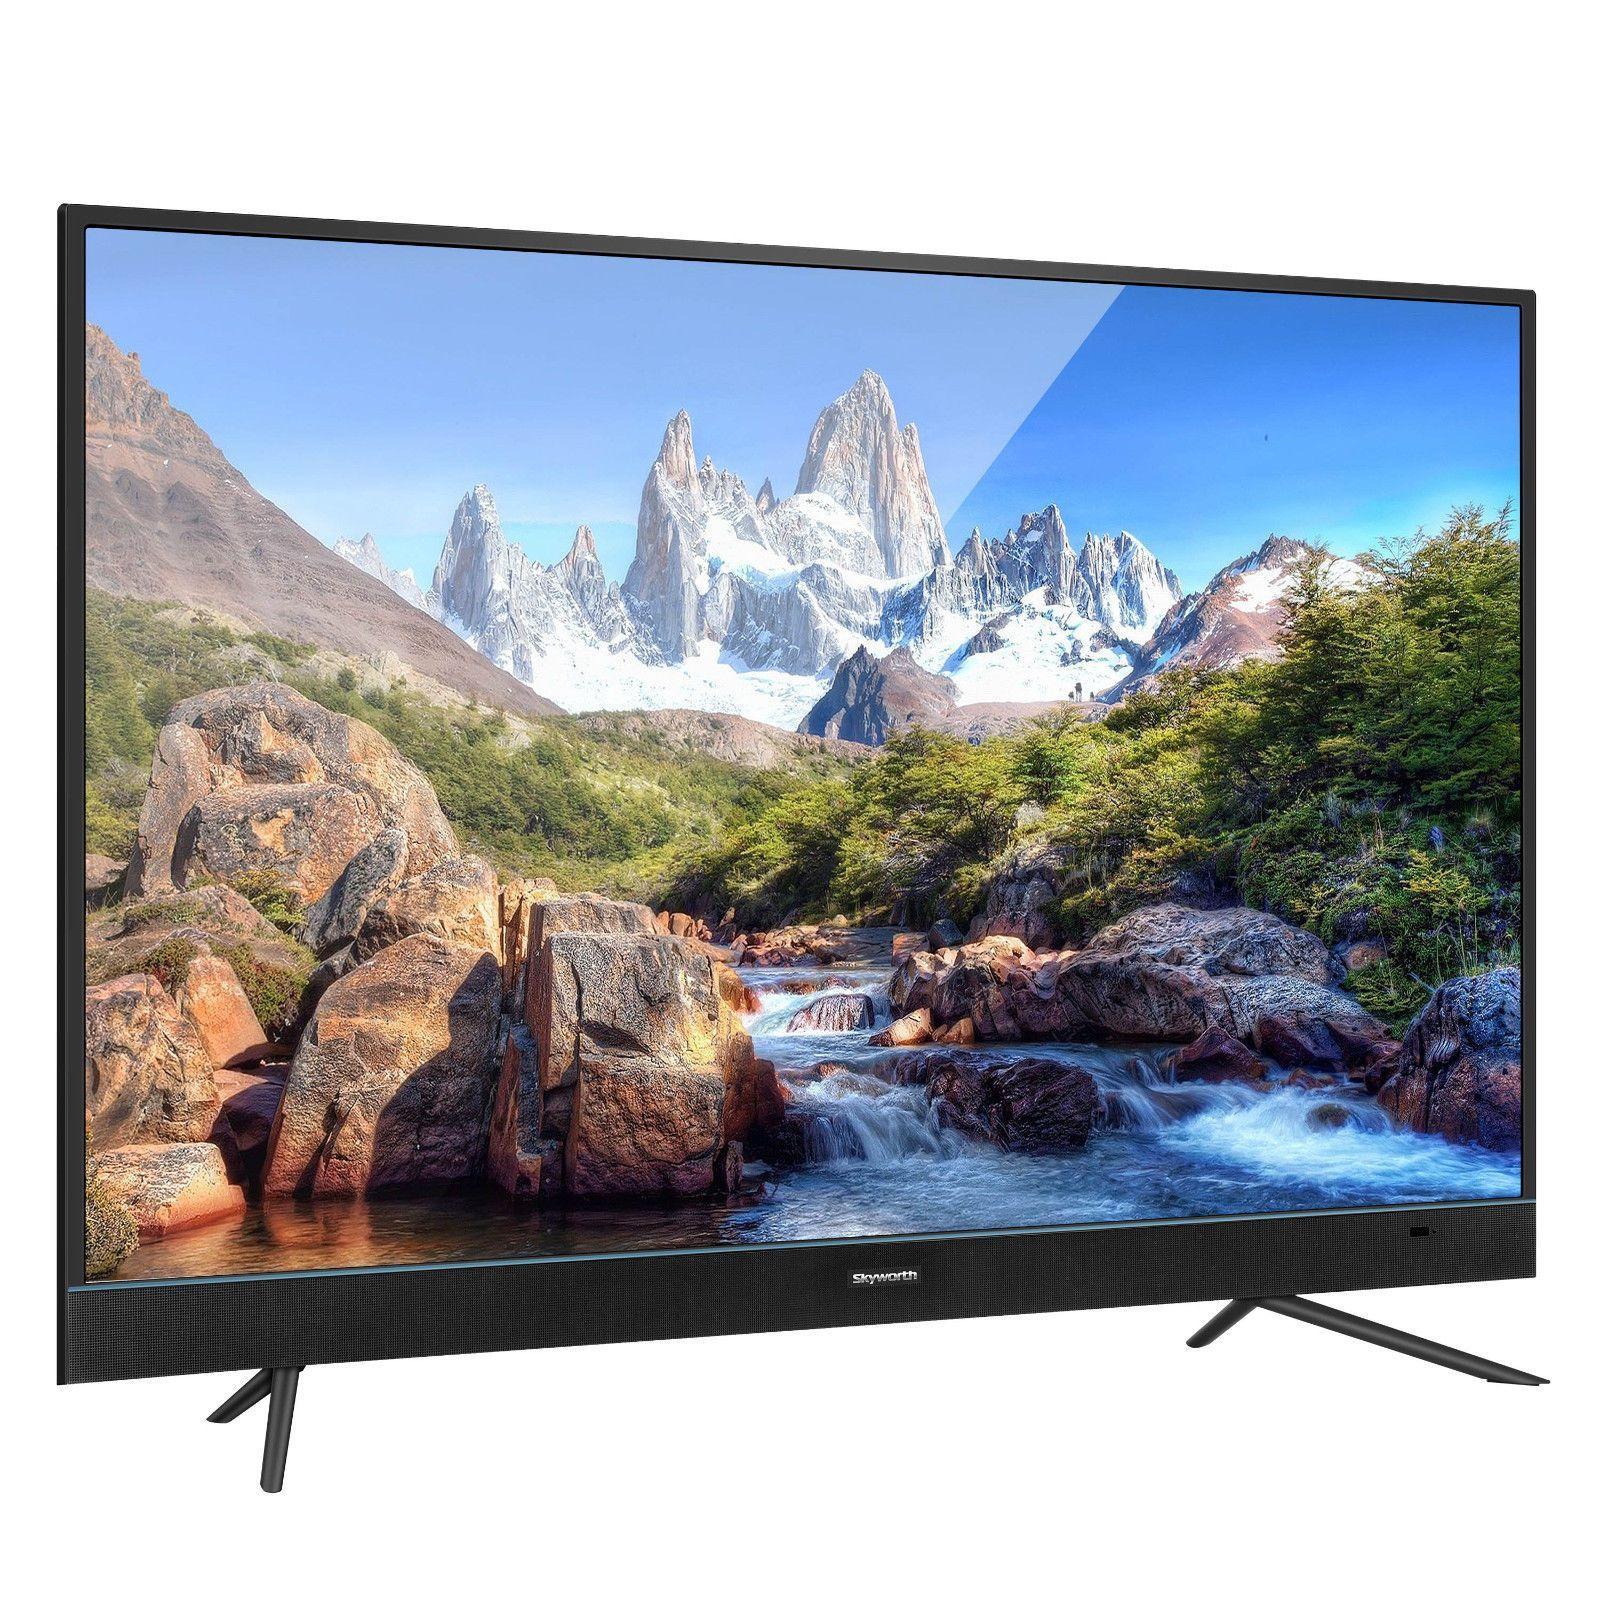 4f108b49778 Insignia NS-50DF710NA19 50-inch 4K Ultra HD Smart LED TV HDR -Fire TV  Edition  1